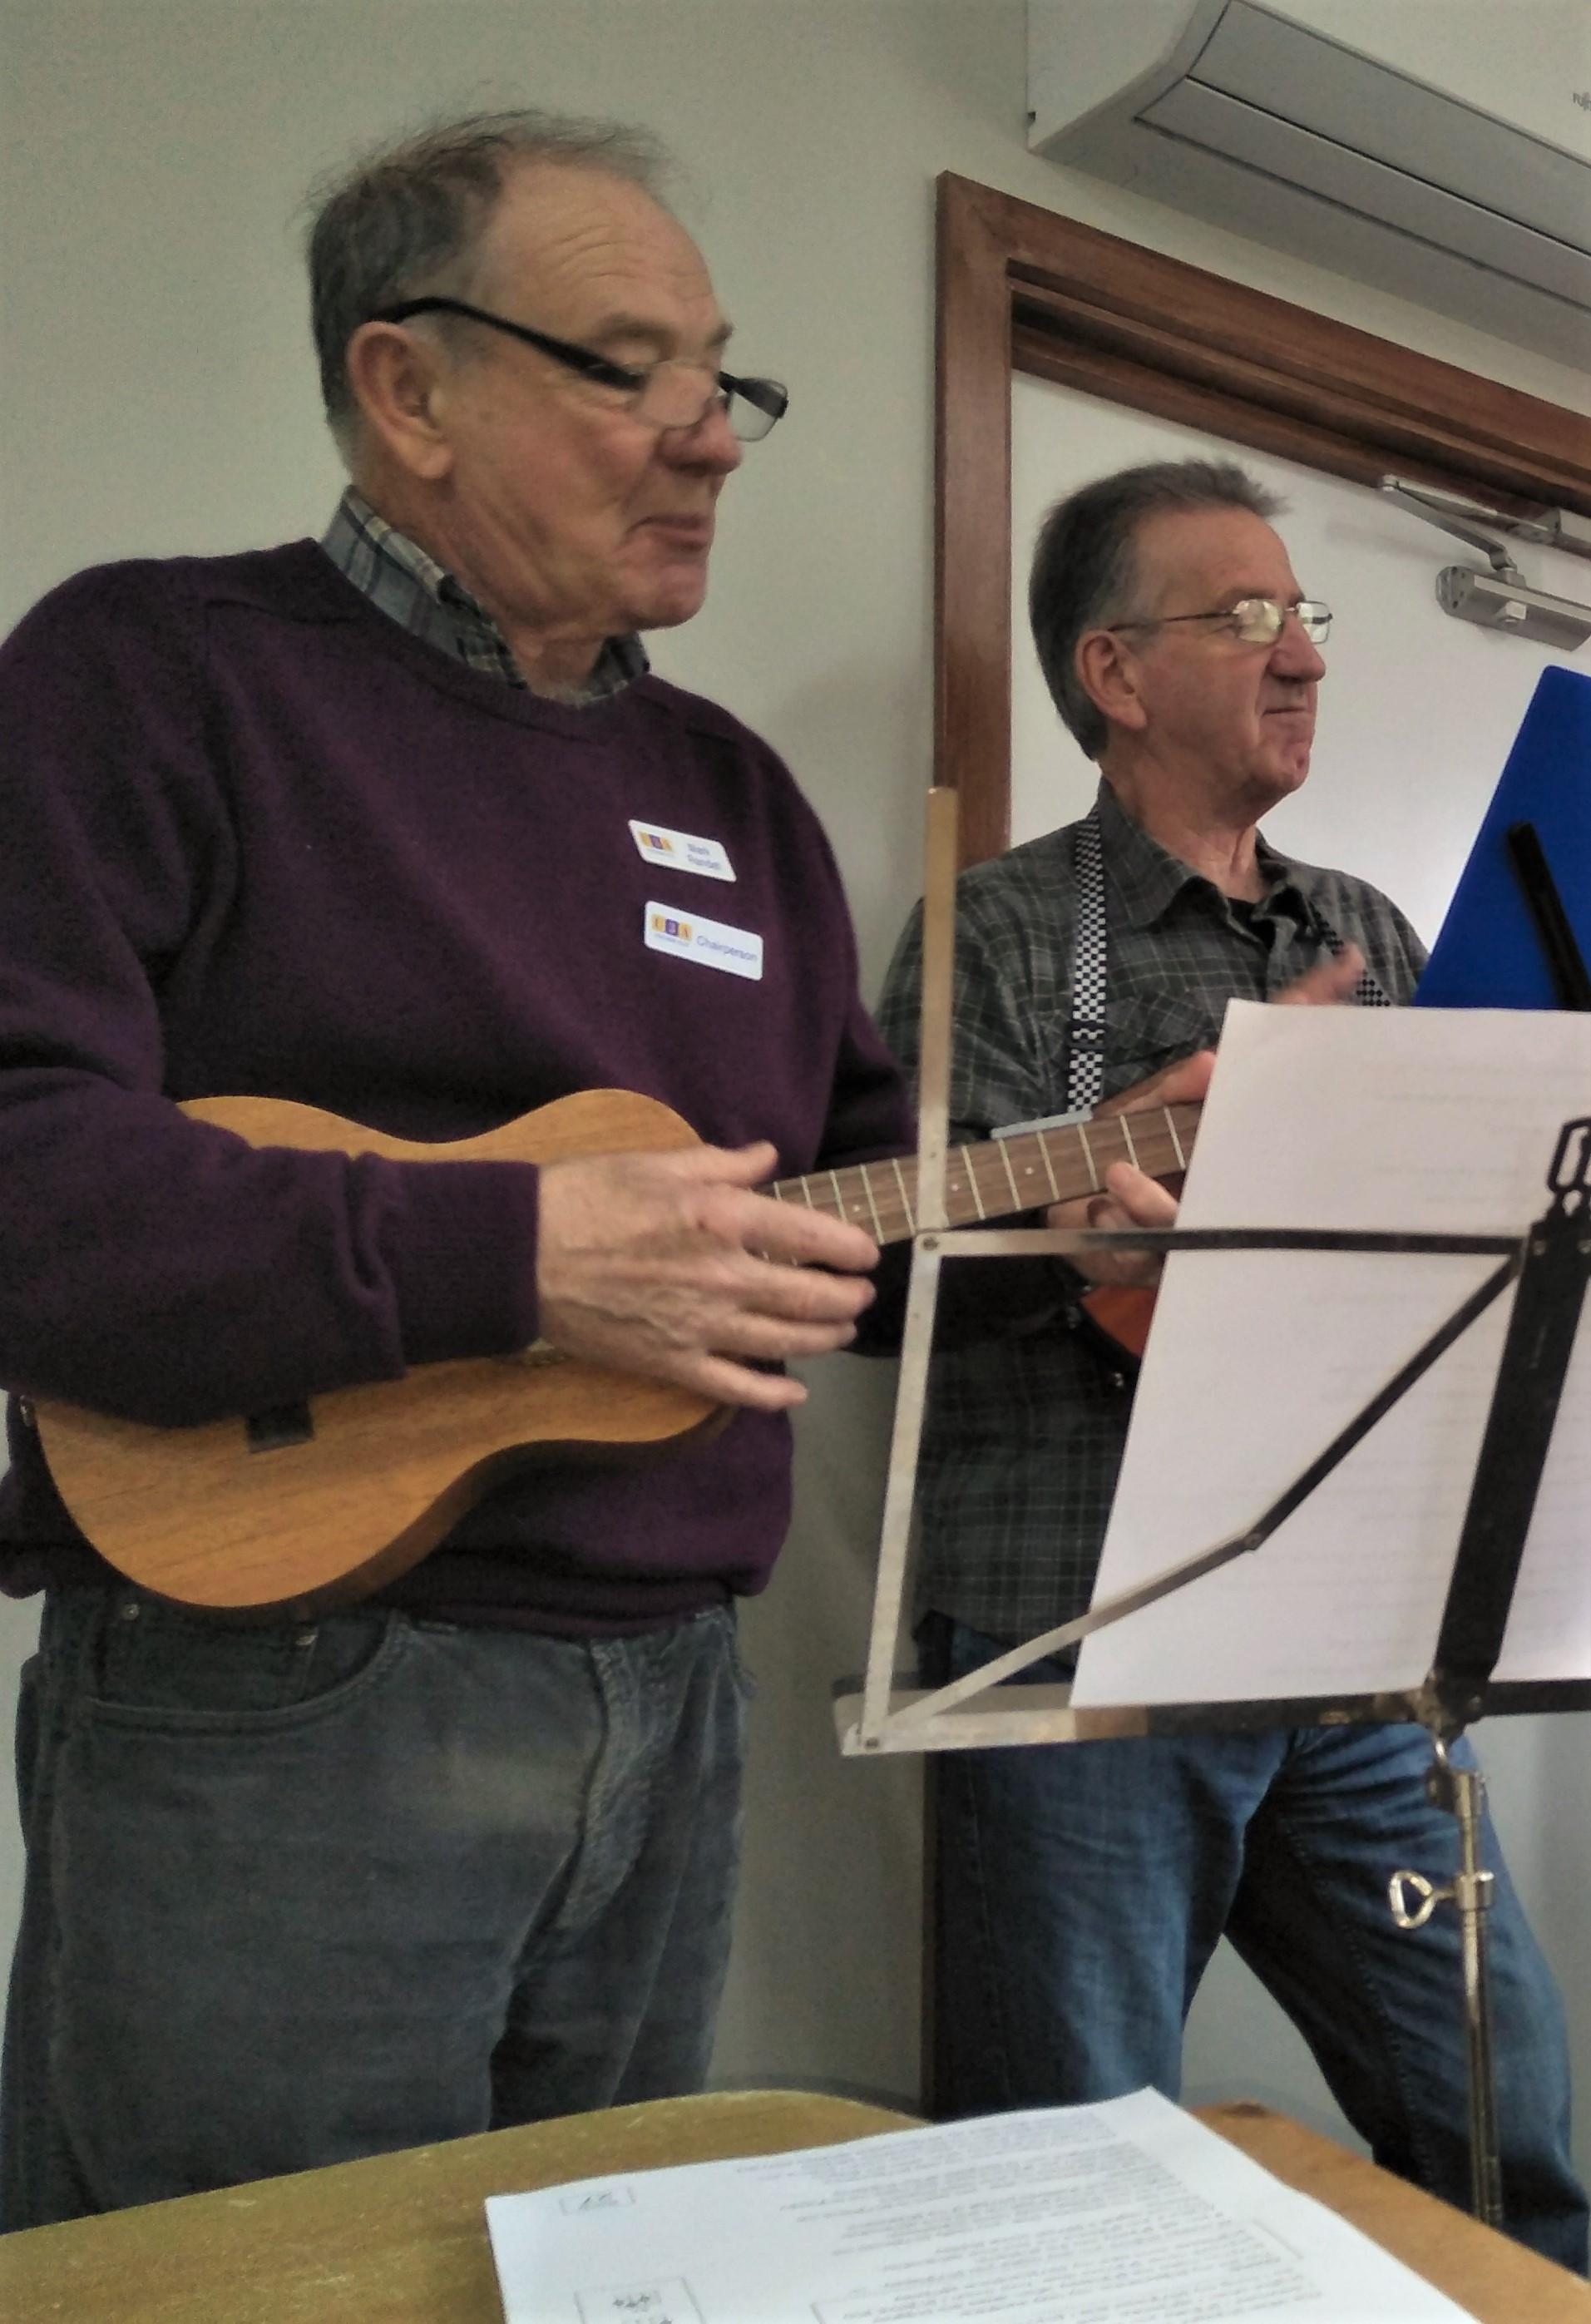 Mark & Geoff strummin